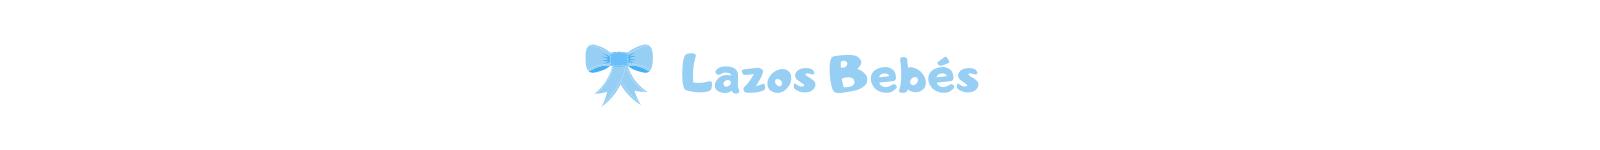 www.lazosbebes.com